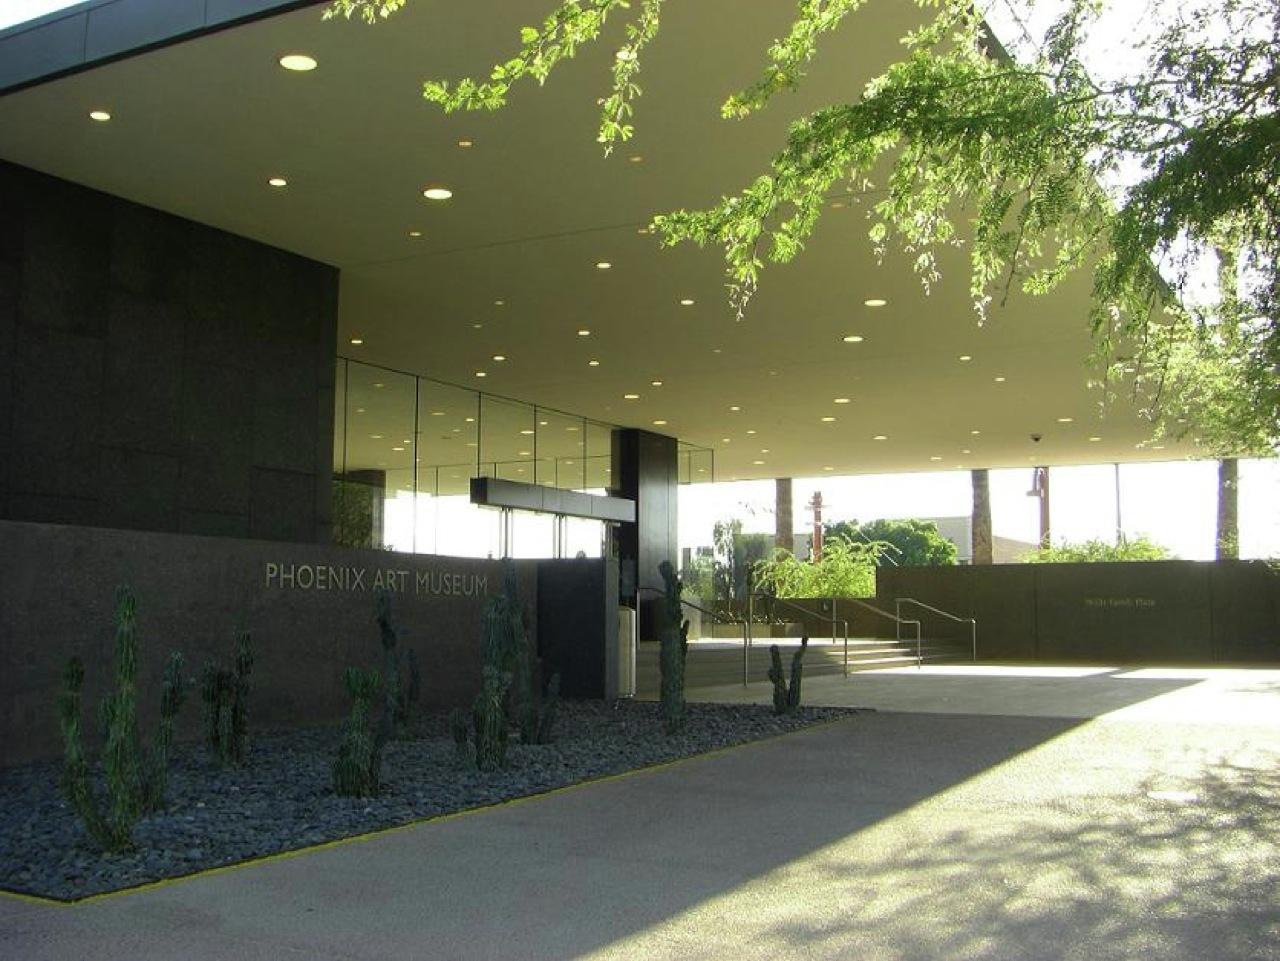 Architecture City Guide Phoenix - 8